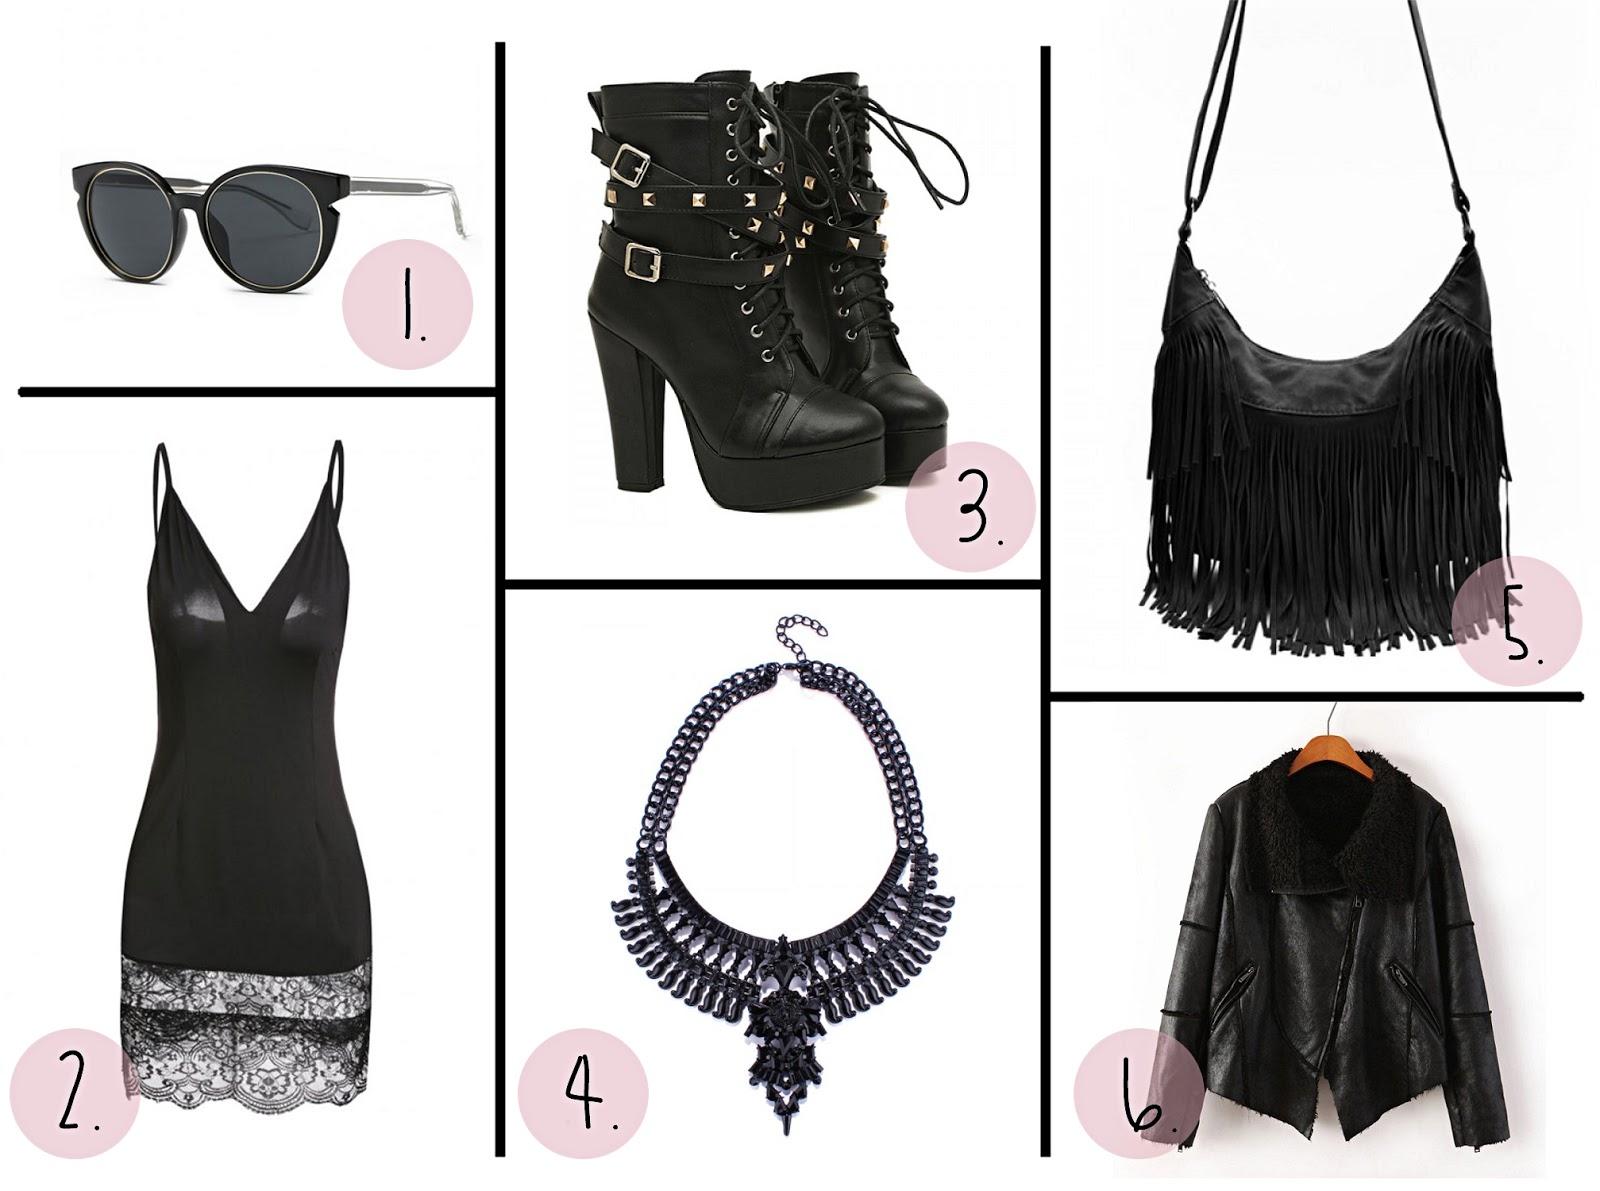 liz breygel beauty angel fashion beauty blogger casual street fashion style